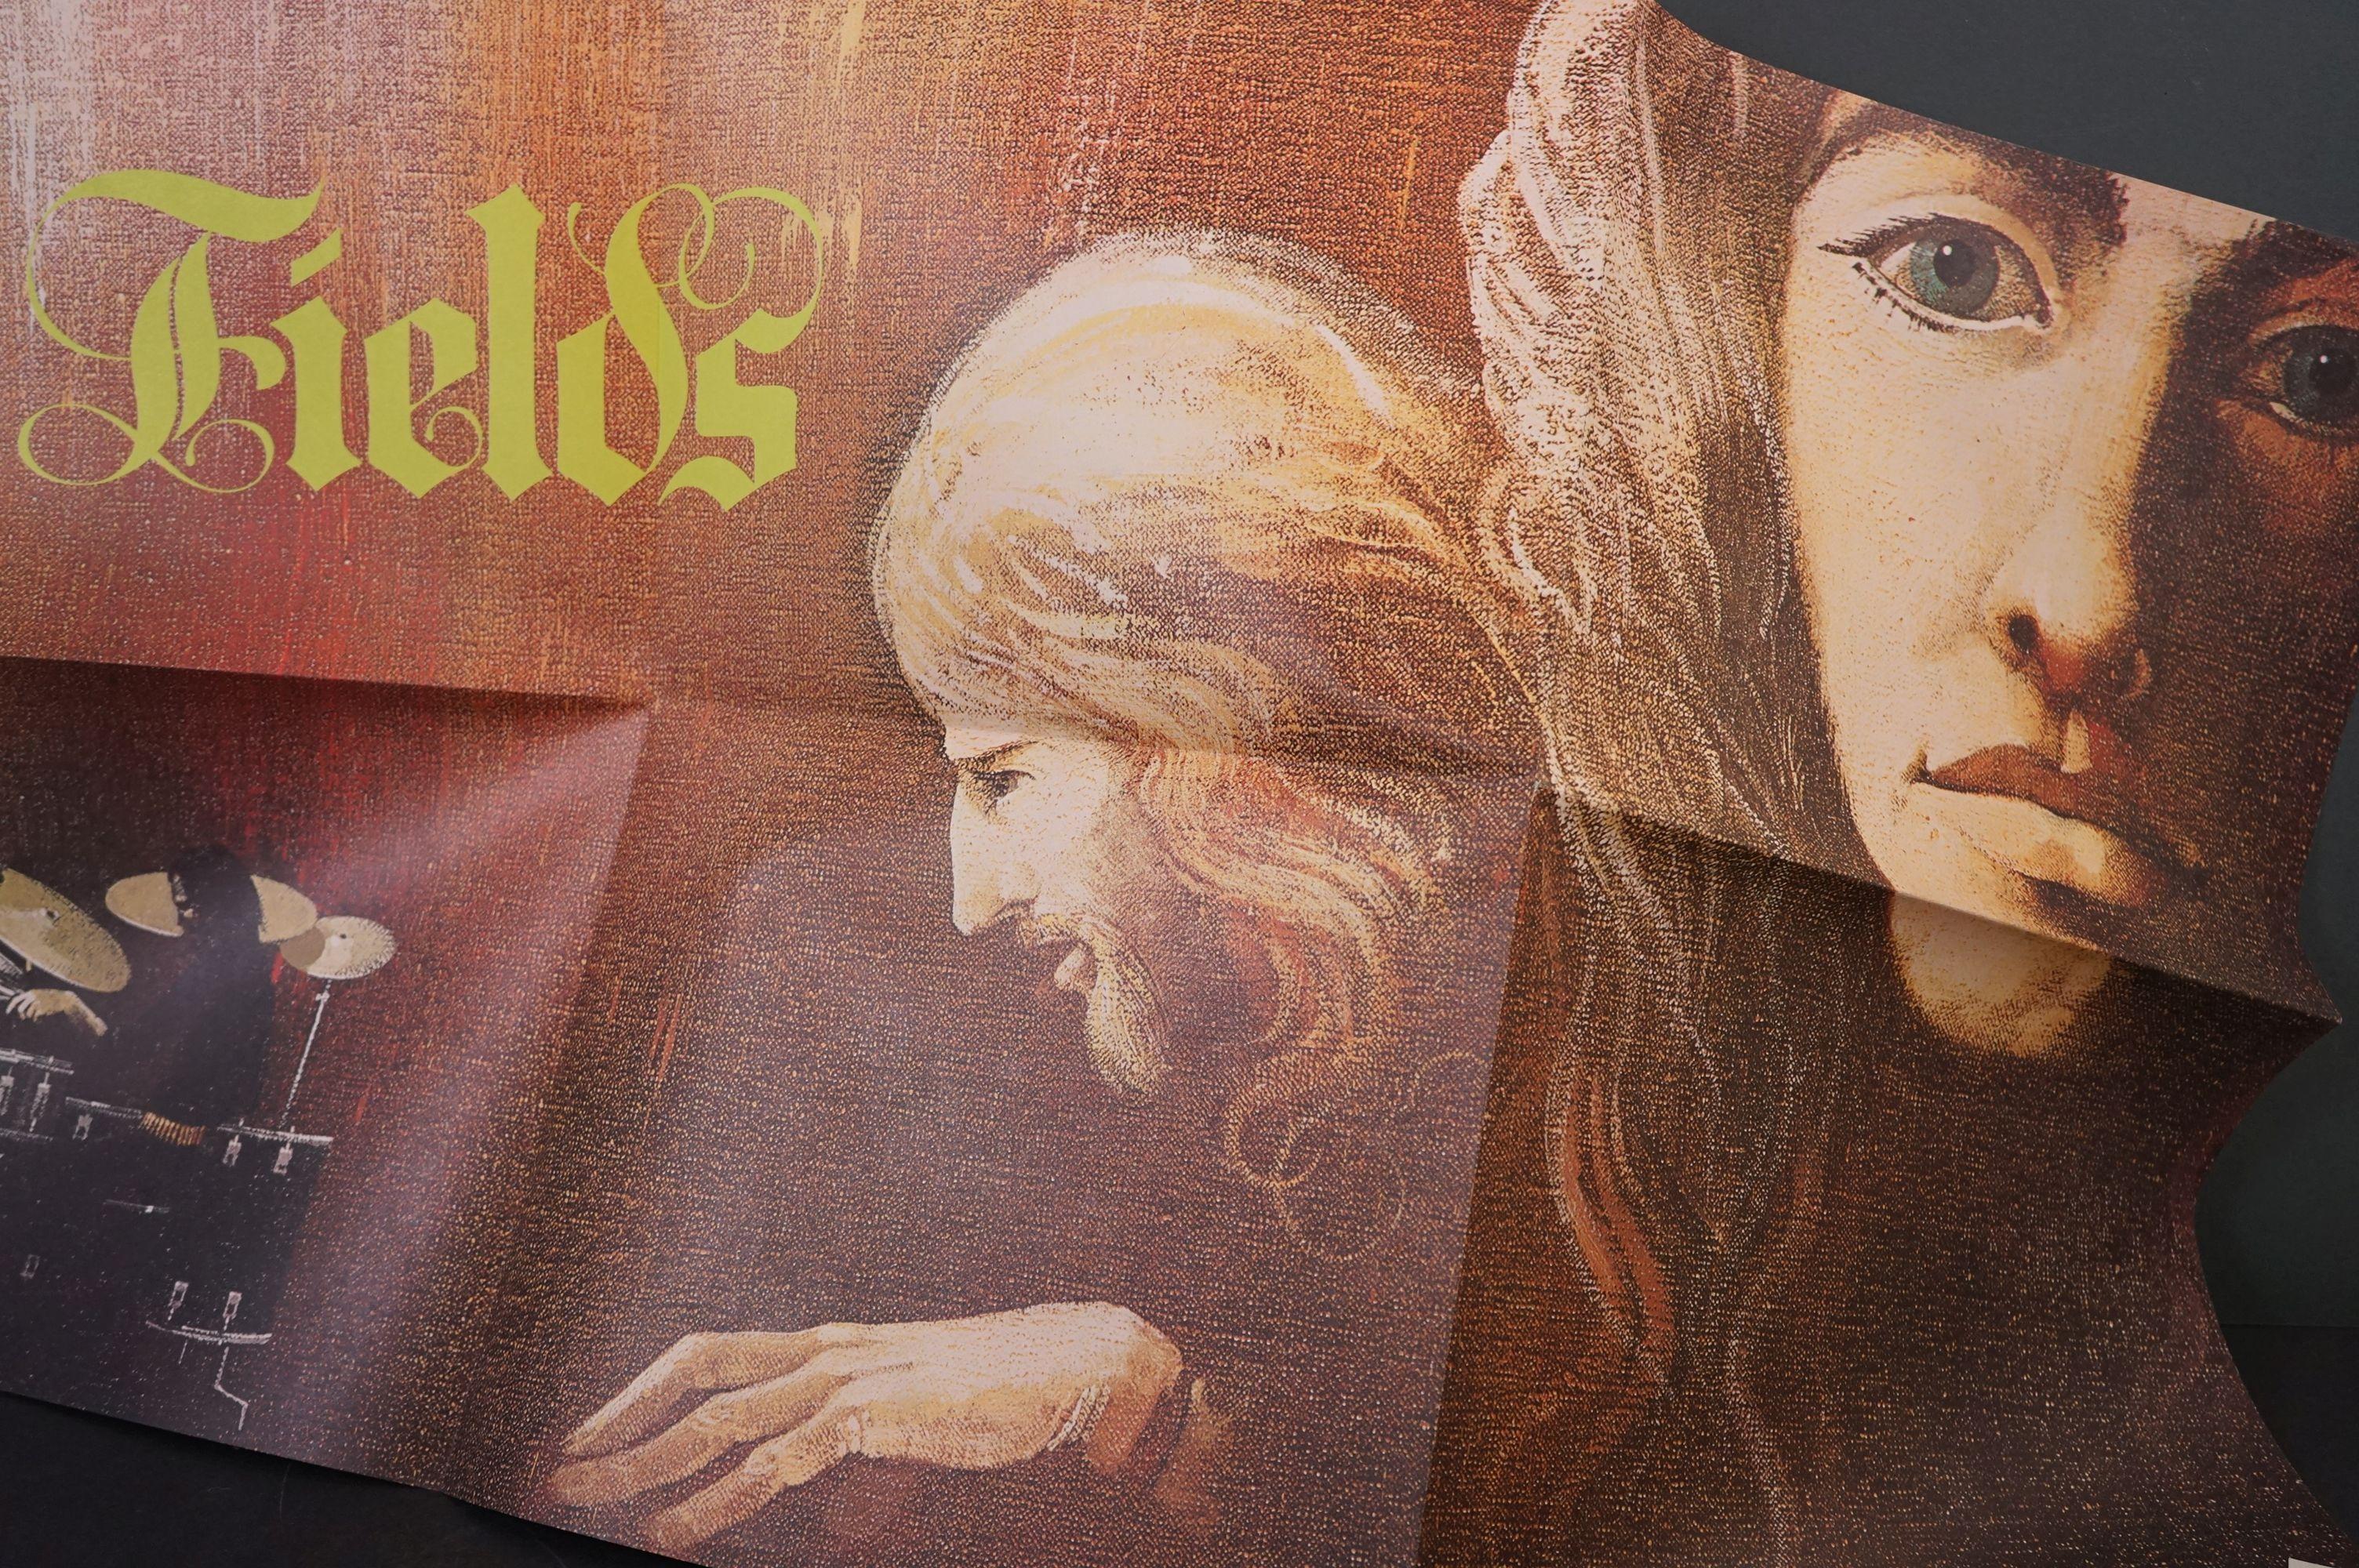 Vinyl - Prog Rock - Fields - Fields. UK 1st 1971 pressing with scarce poster, gatefold sleeve is - Image 5 of 6